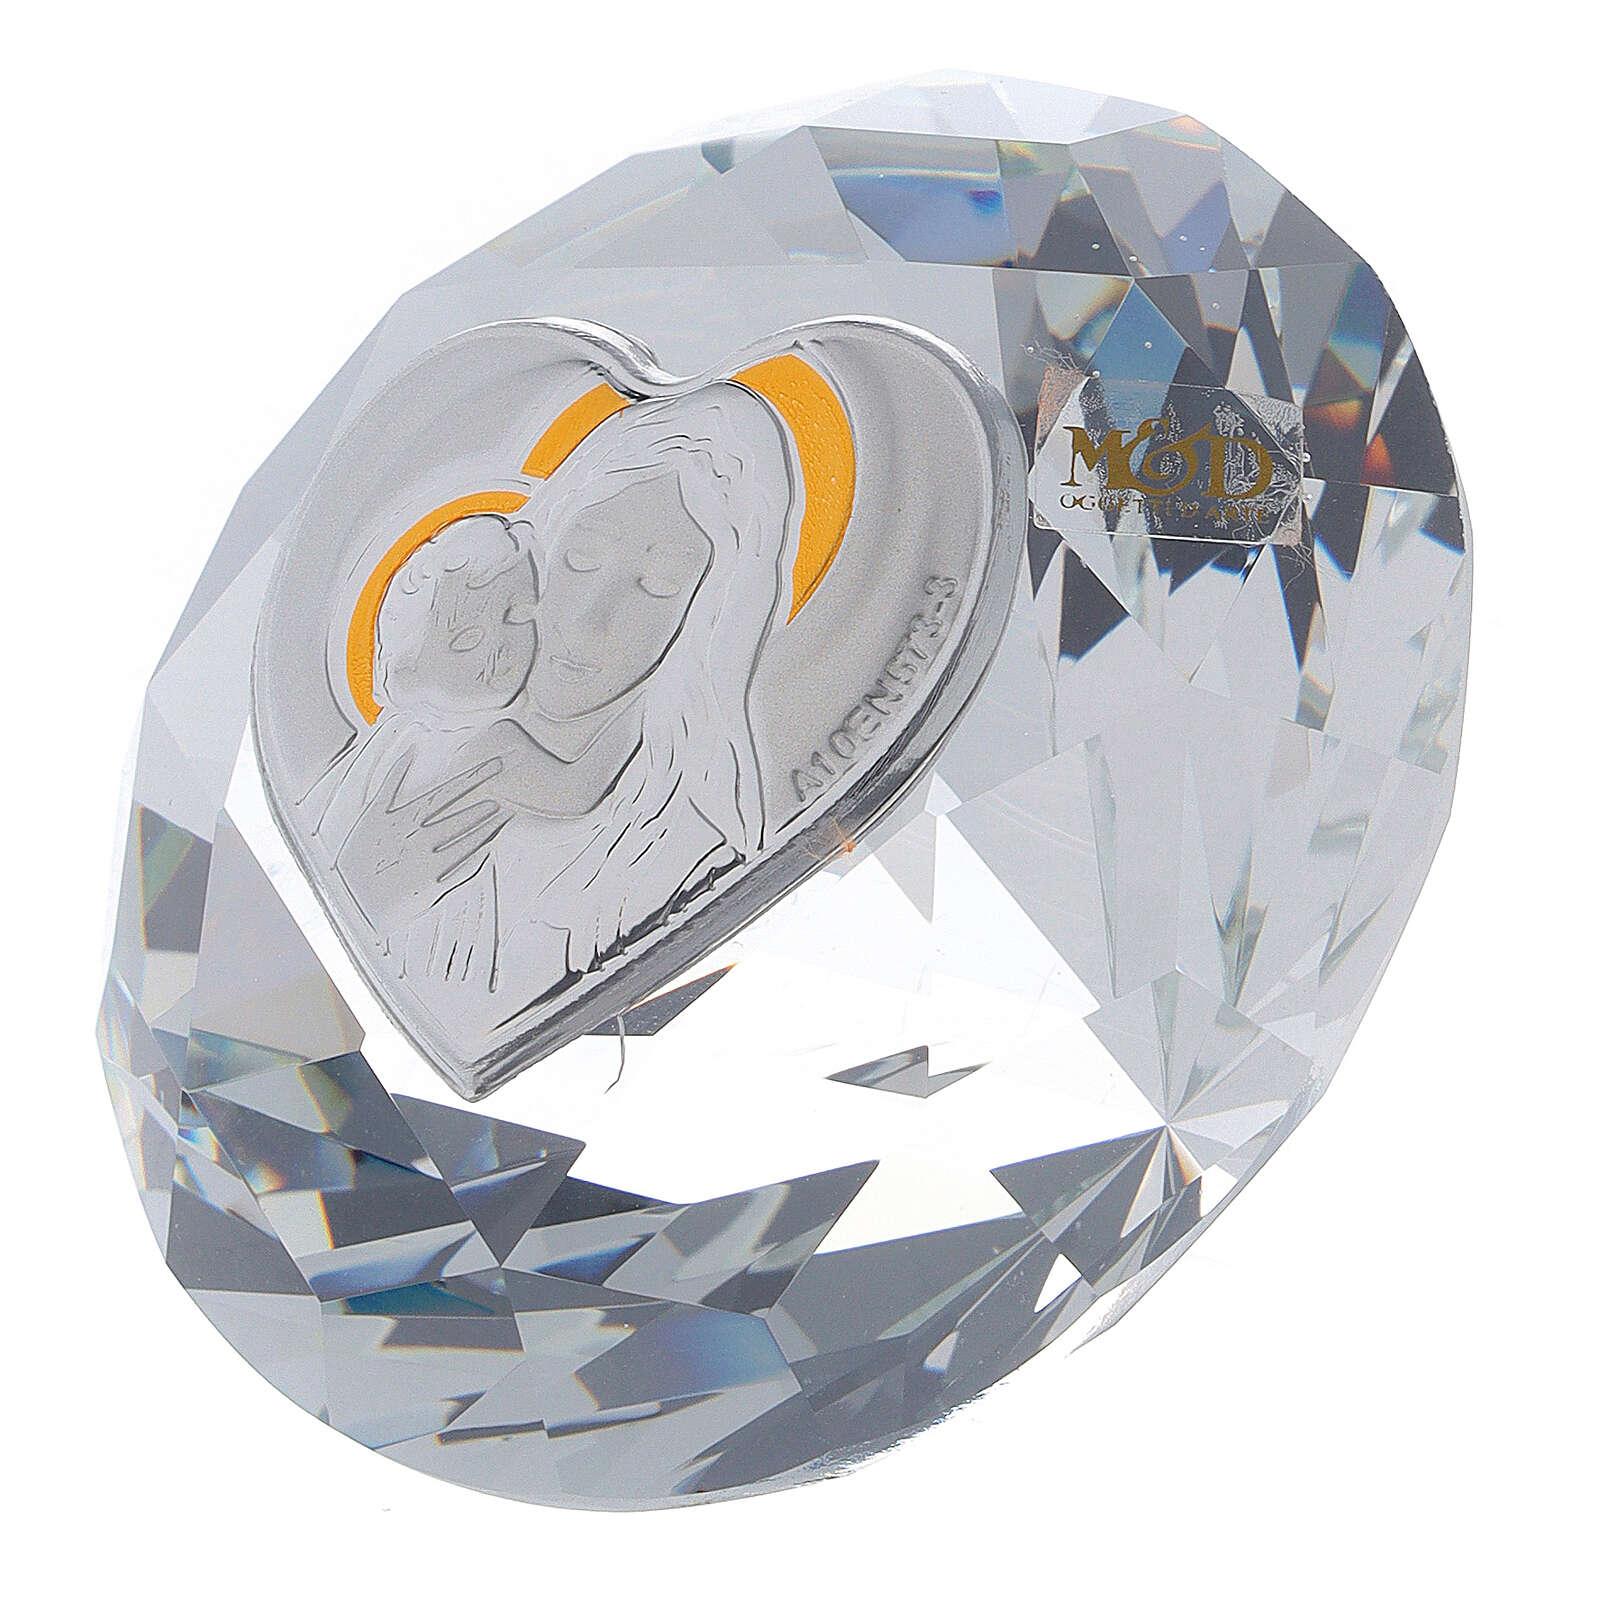 Diamante de vidrio recuerdo maternidad 3